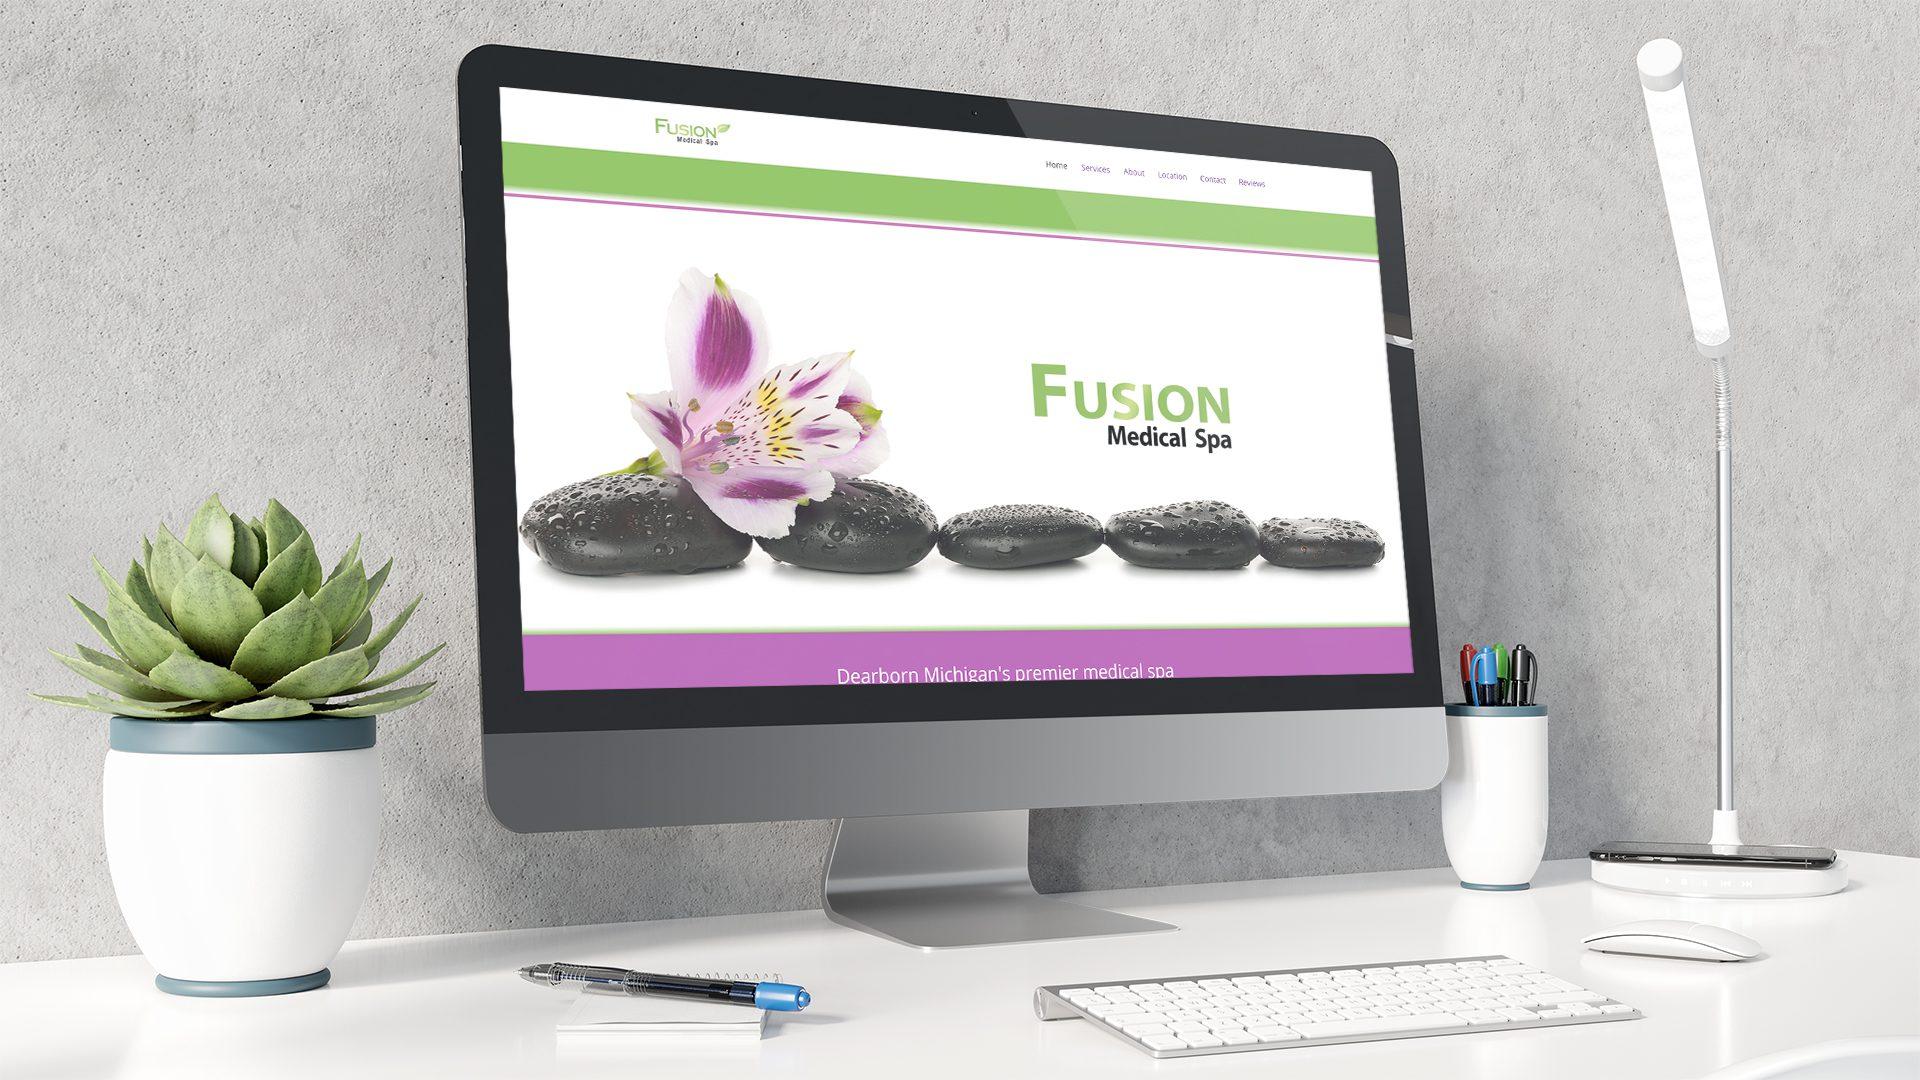 Fusion Spa - Website mockup 02